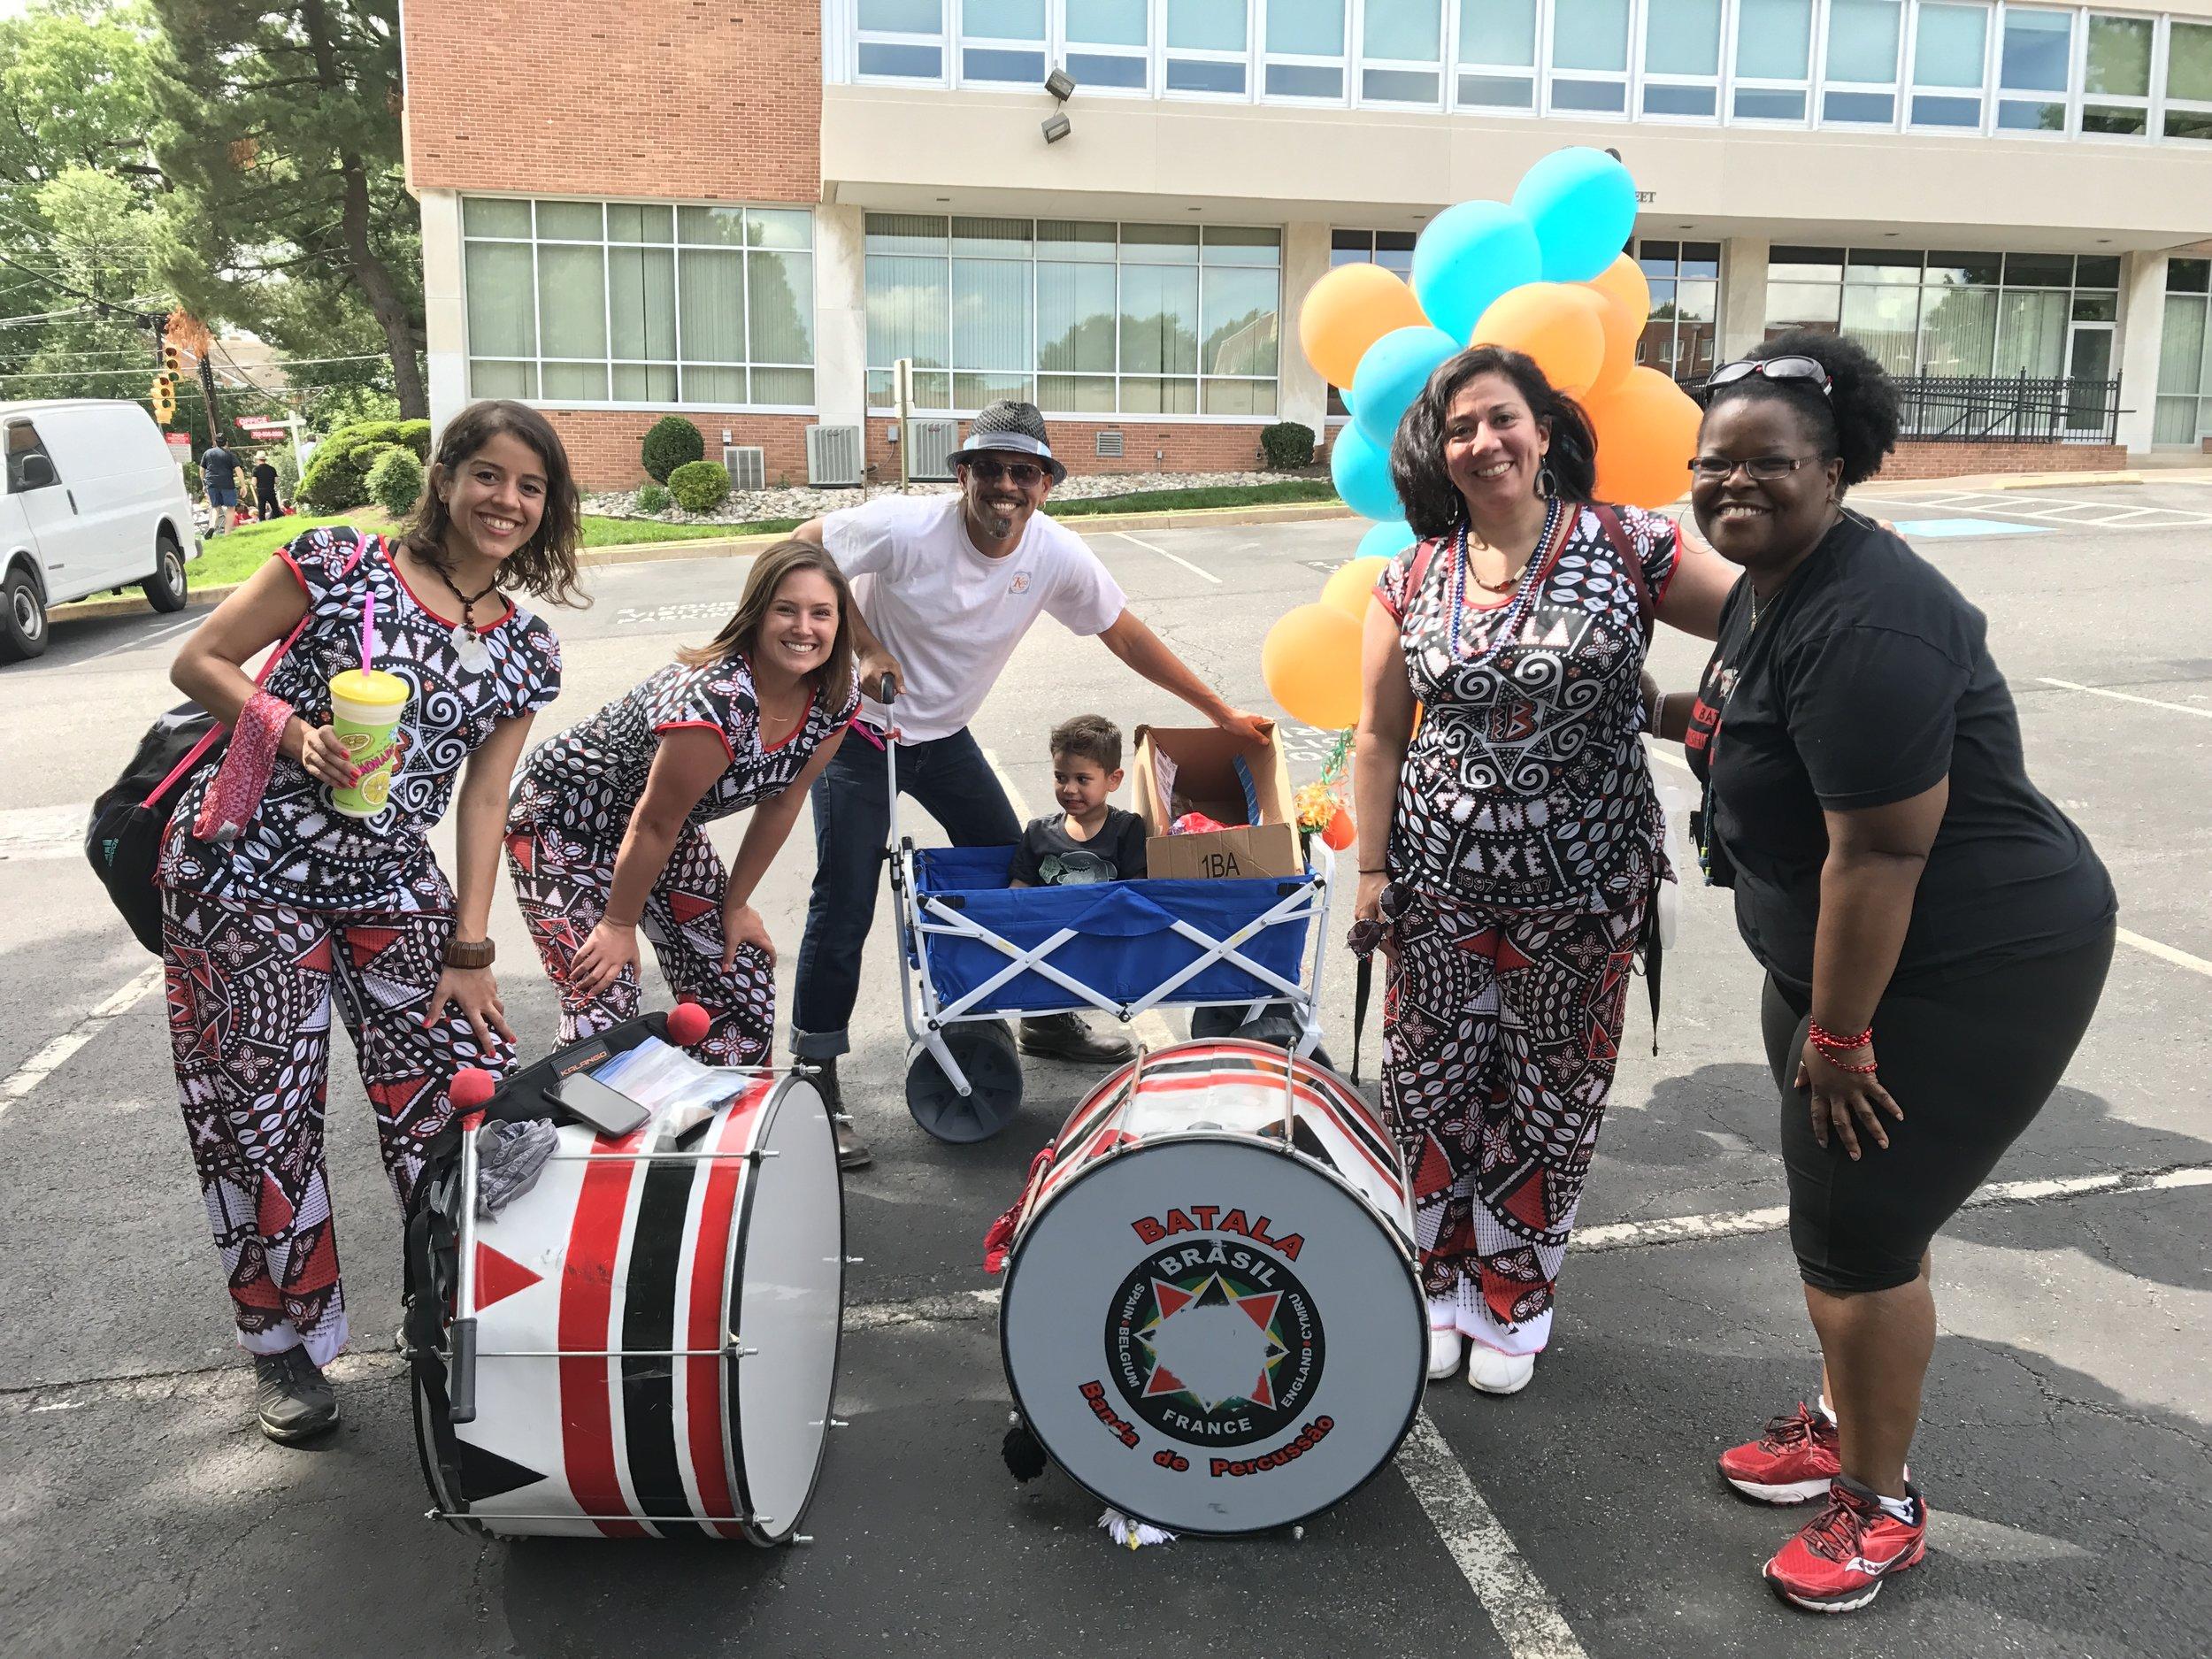 Royston with Batala Washington (winner of the best marching band)